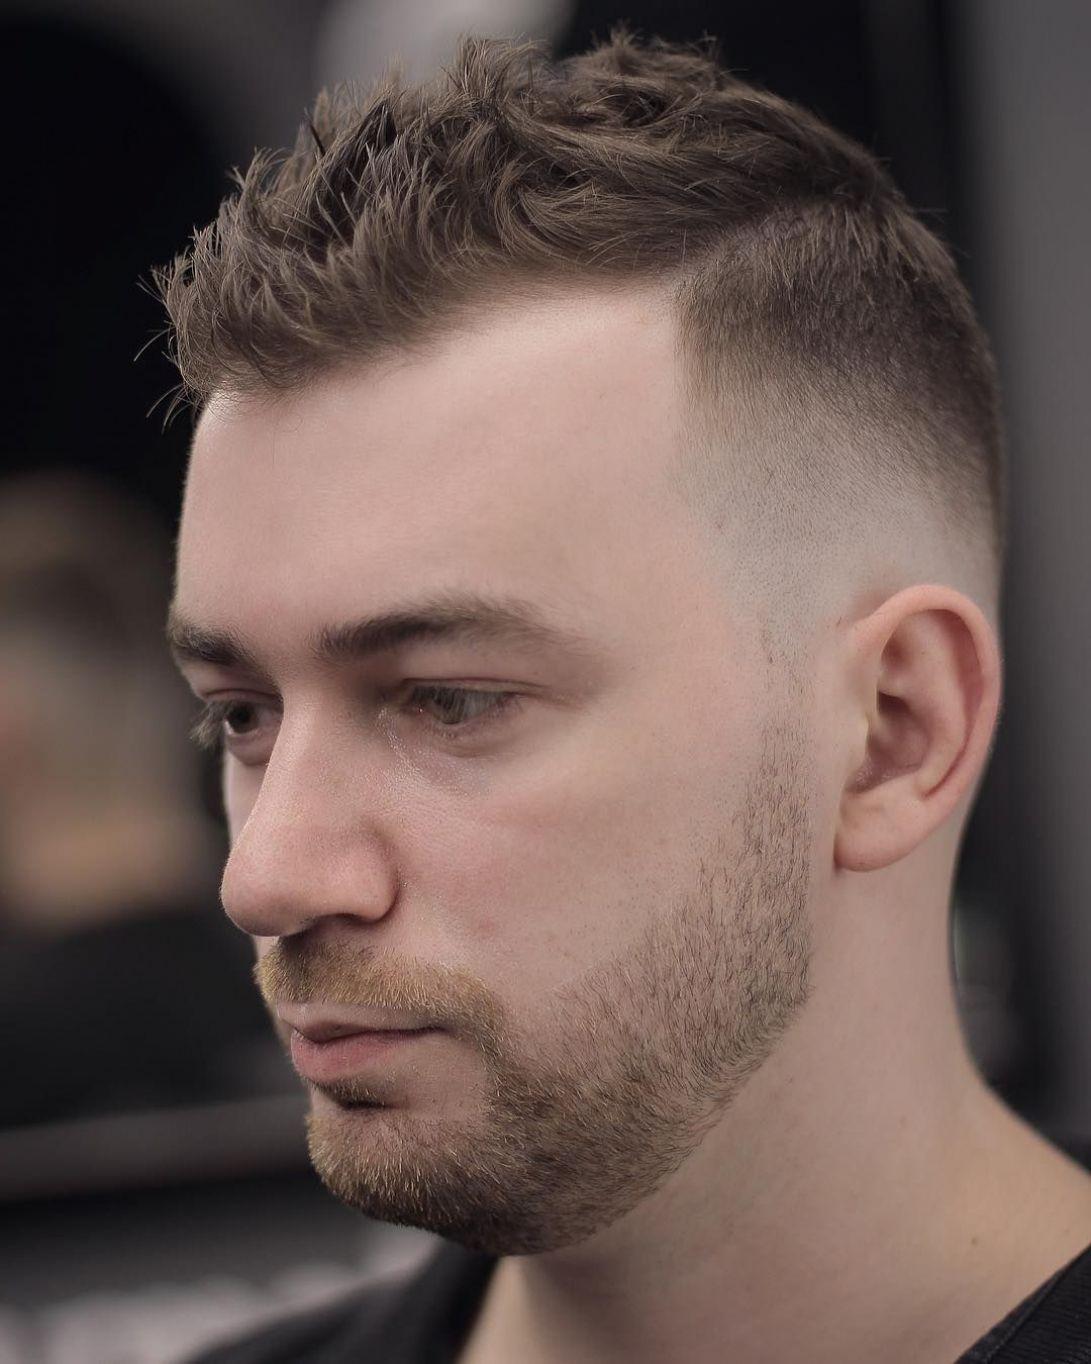 Astonishing Receding Hairline Haircuts 2019 Gain Male Men